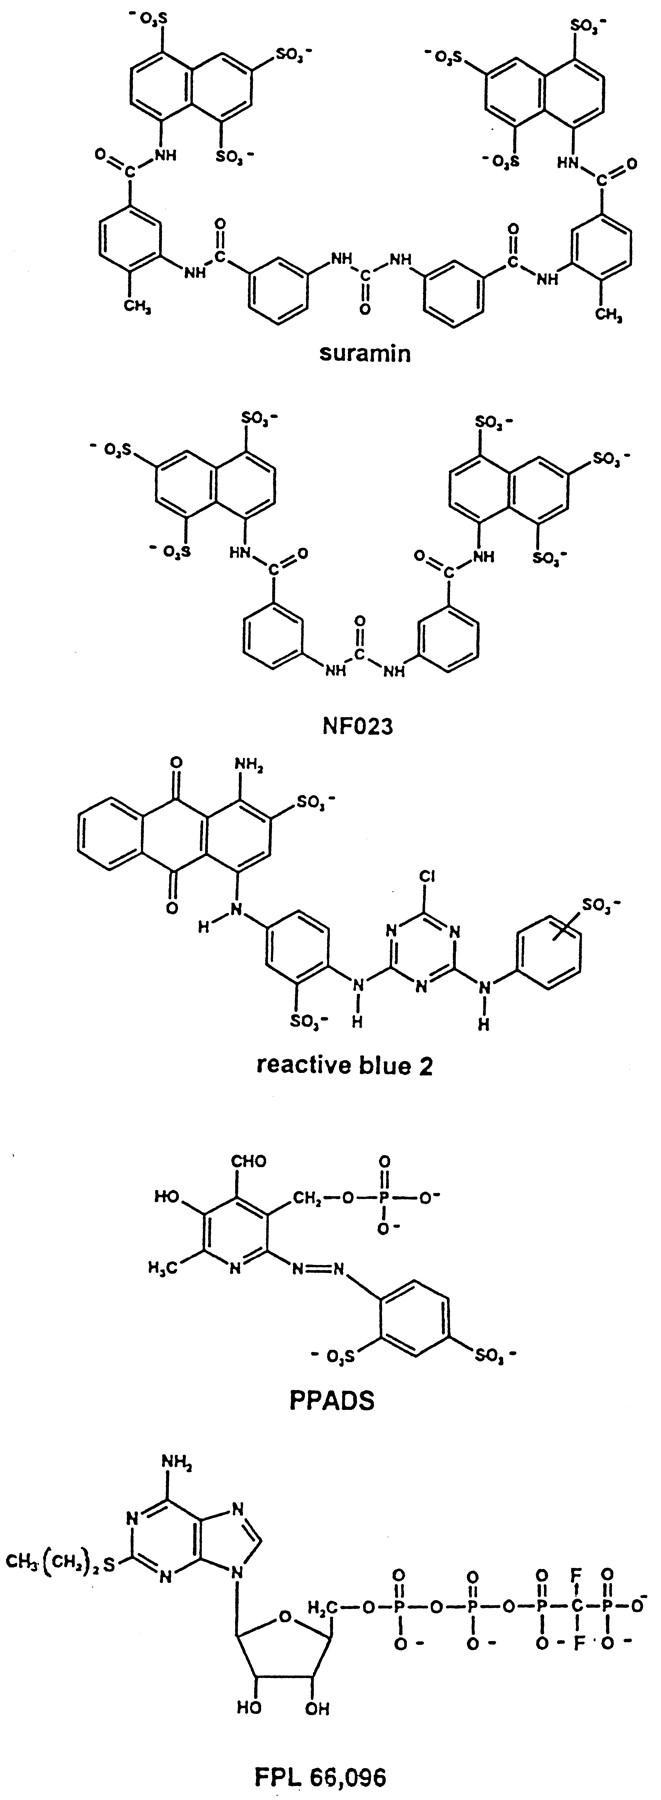 Pharmacology of Purine and Pyrimidine Receptors